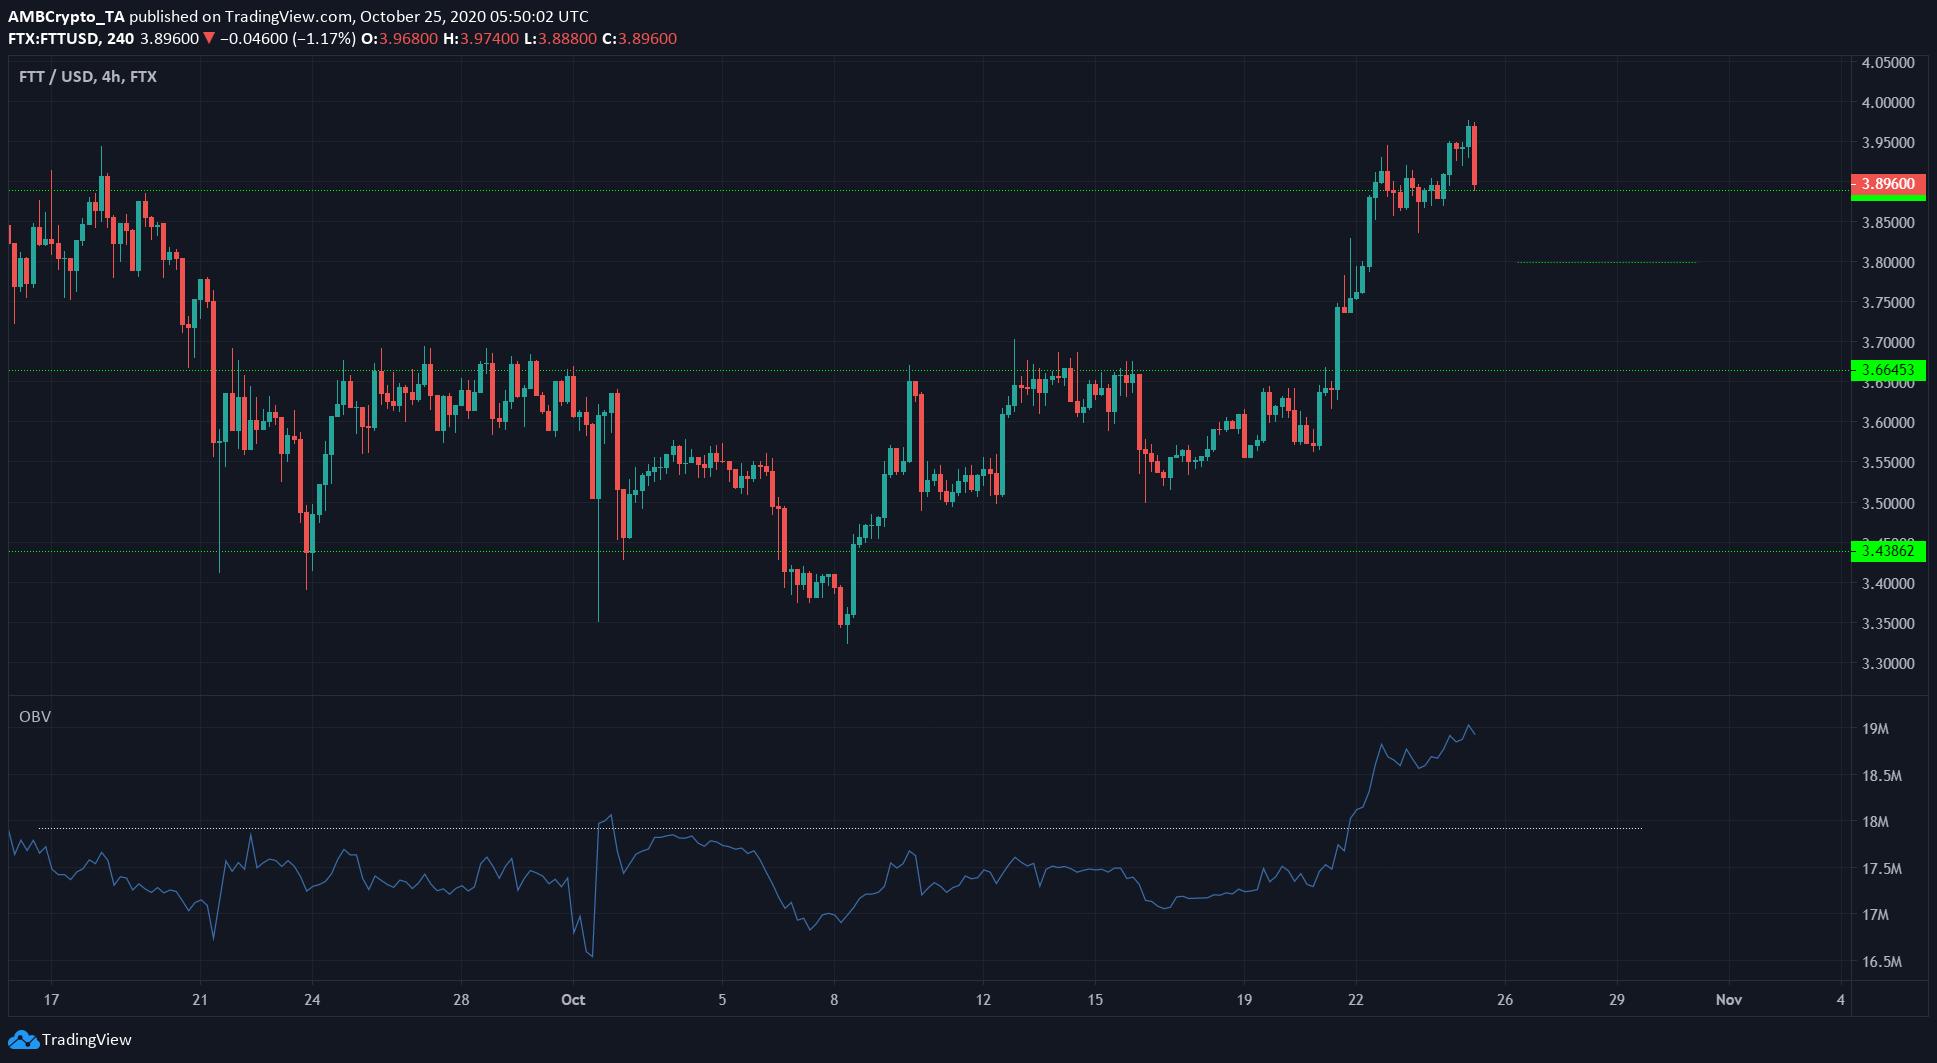 Análisis de precios del token de Litecoin, NEM, FTX: 25 de octubre